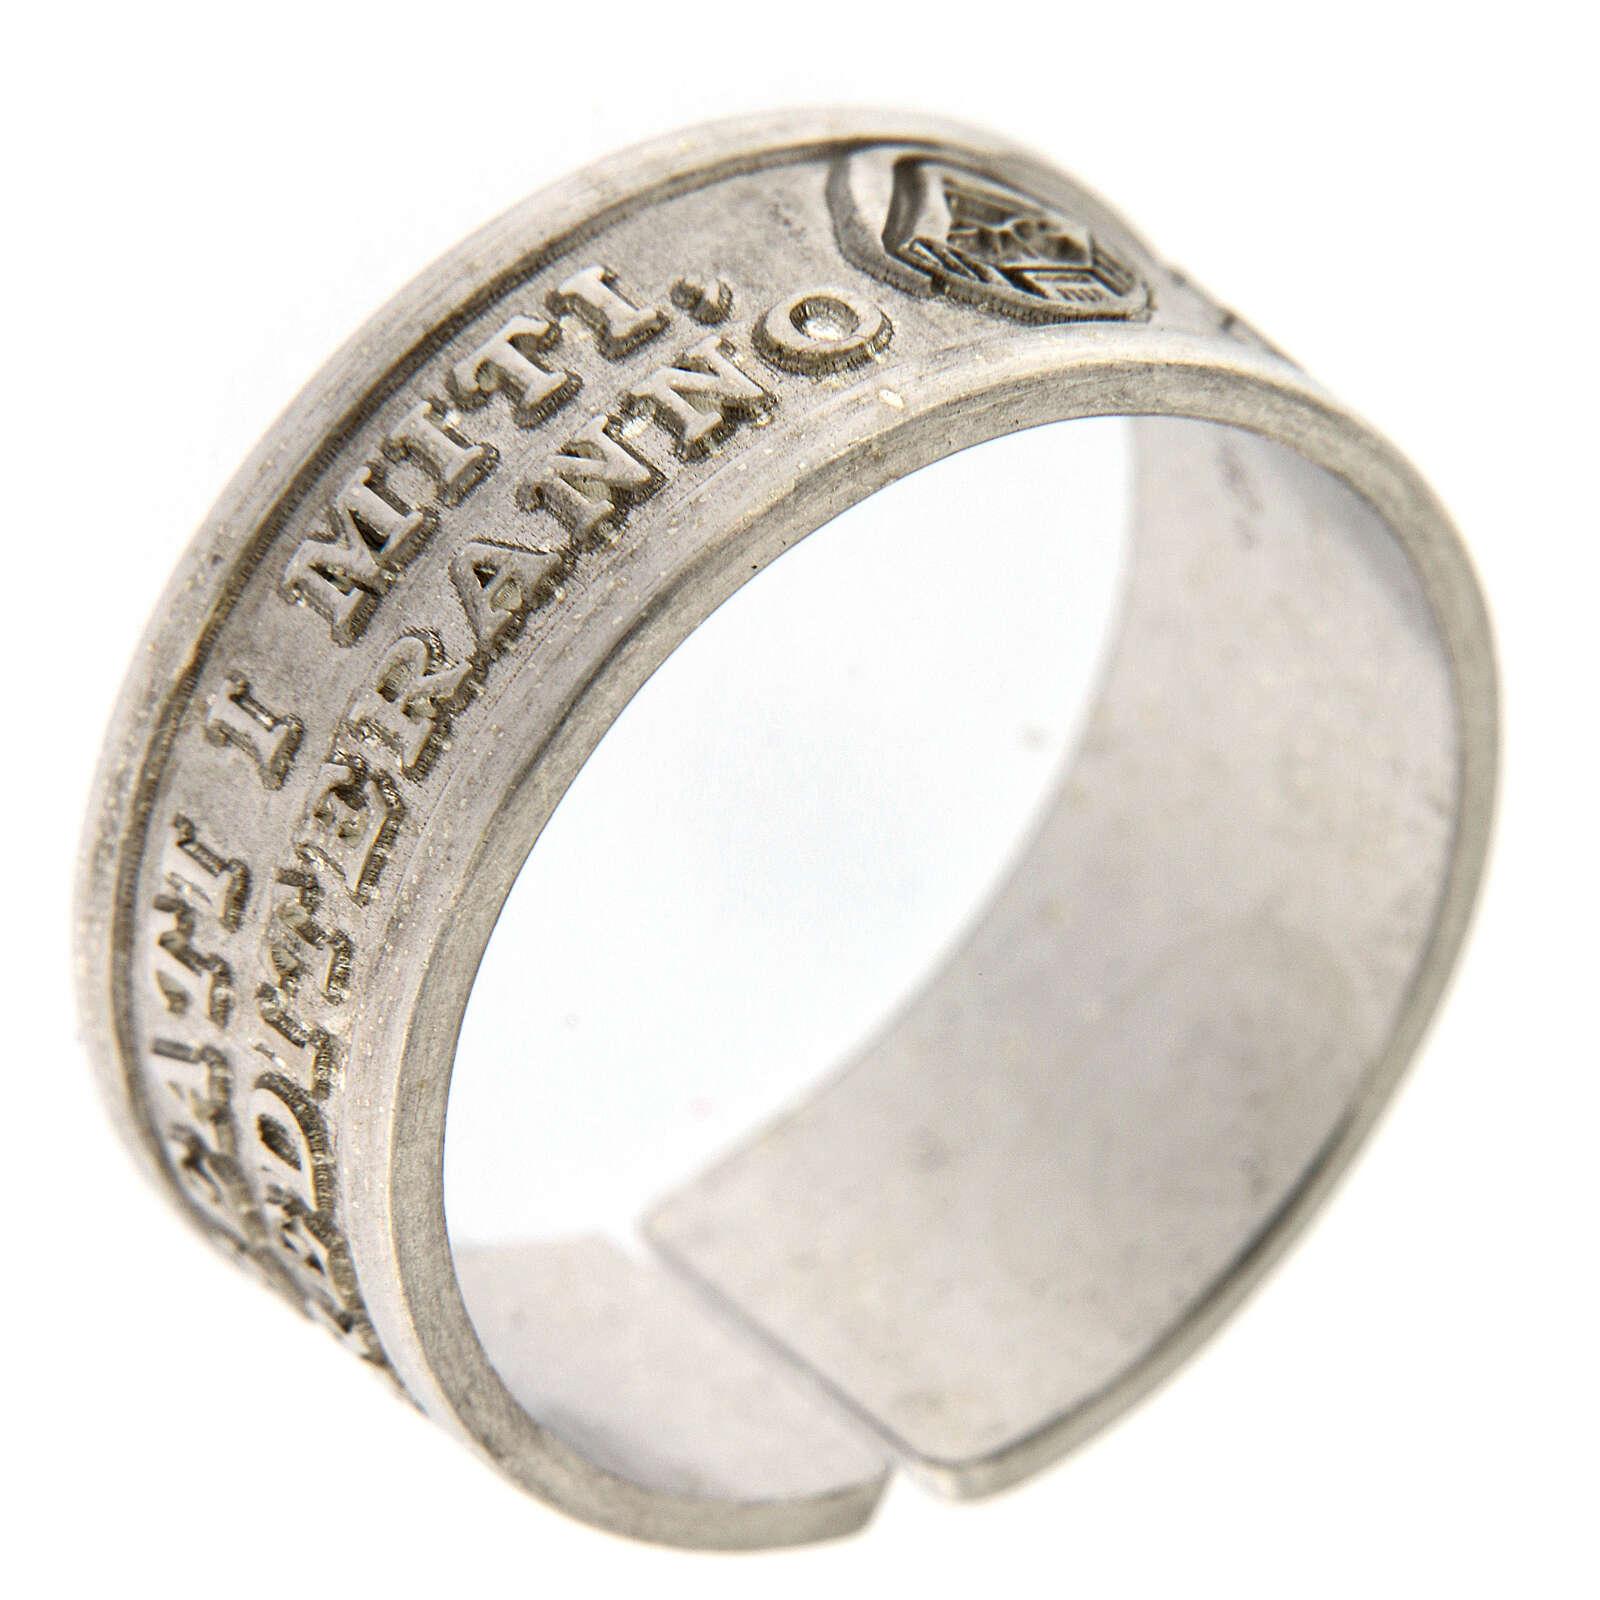 Anello Beati i Miti argento 925 apertura regolabile 3